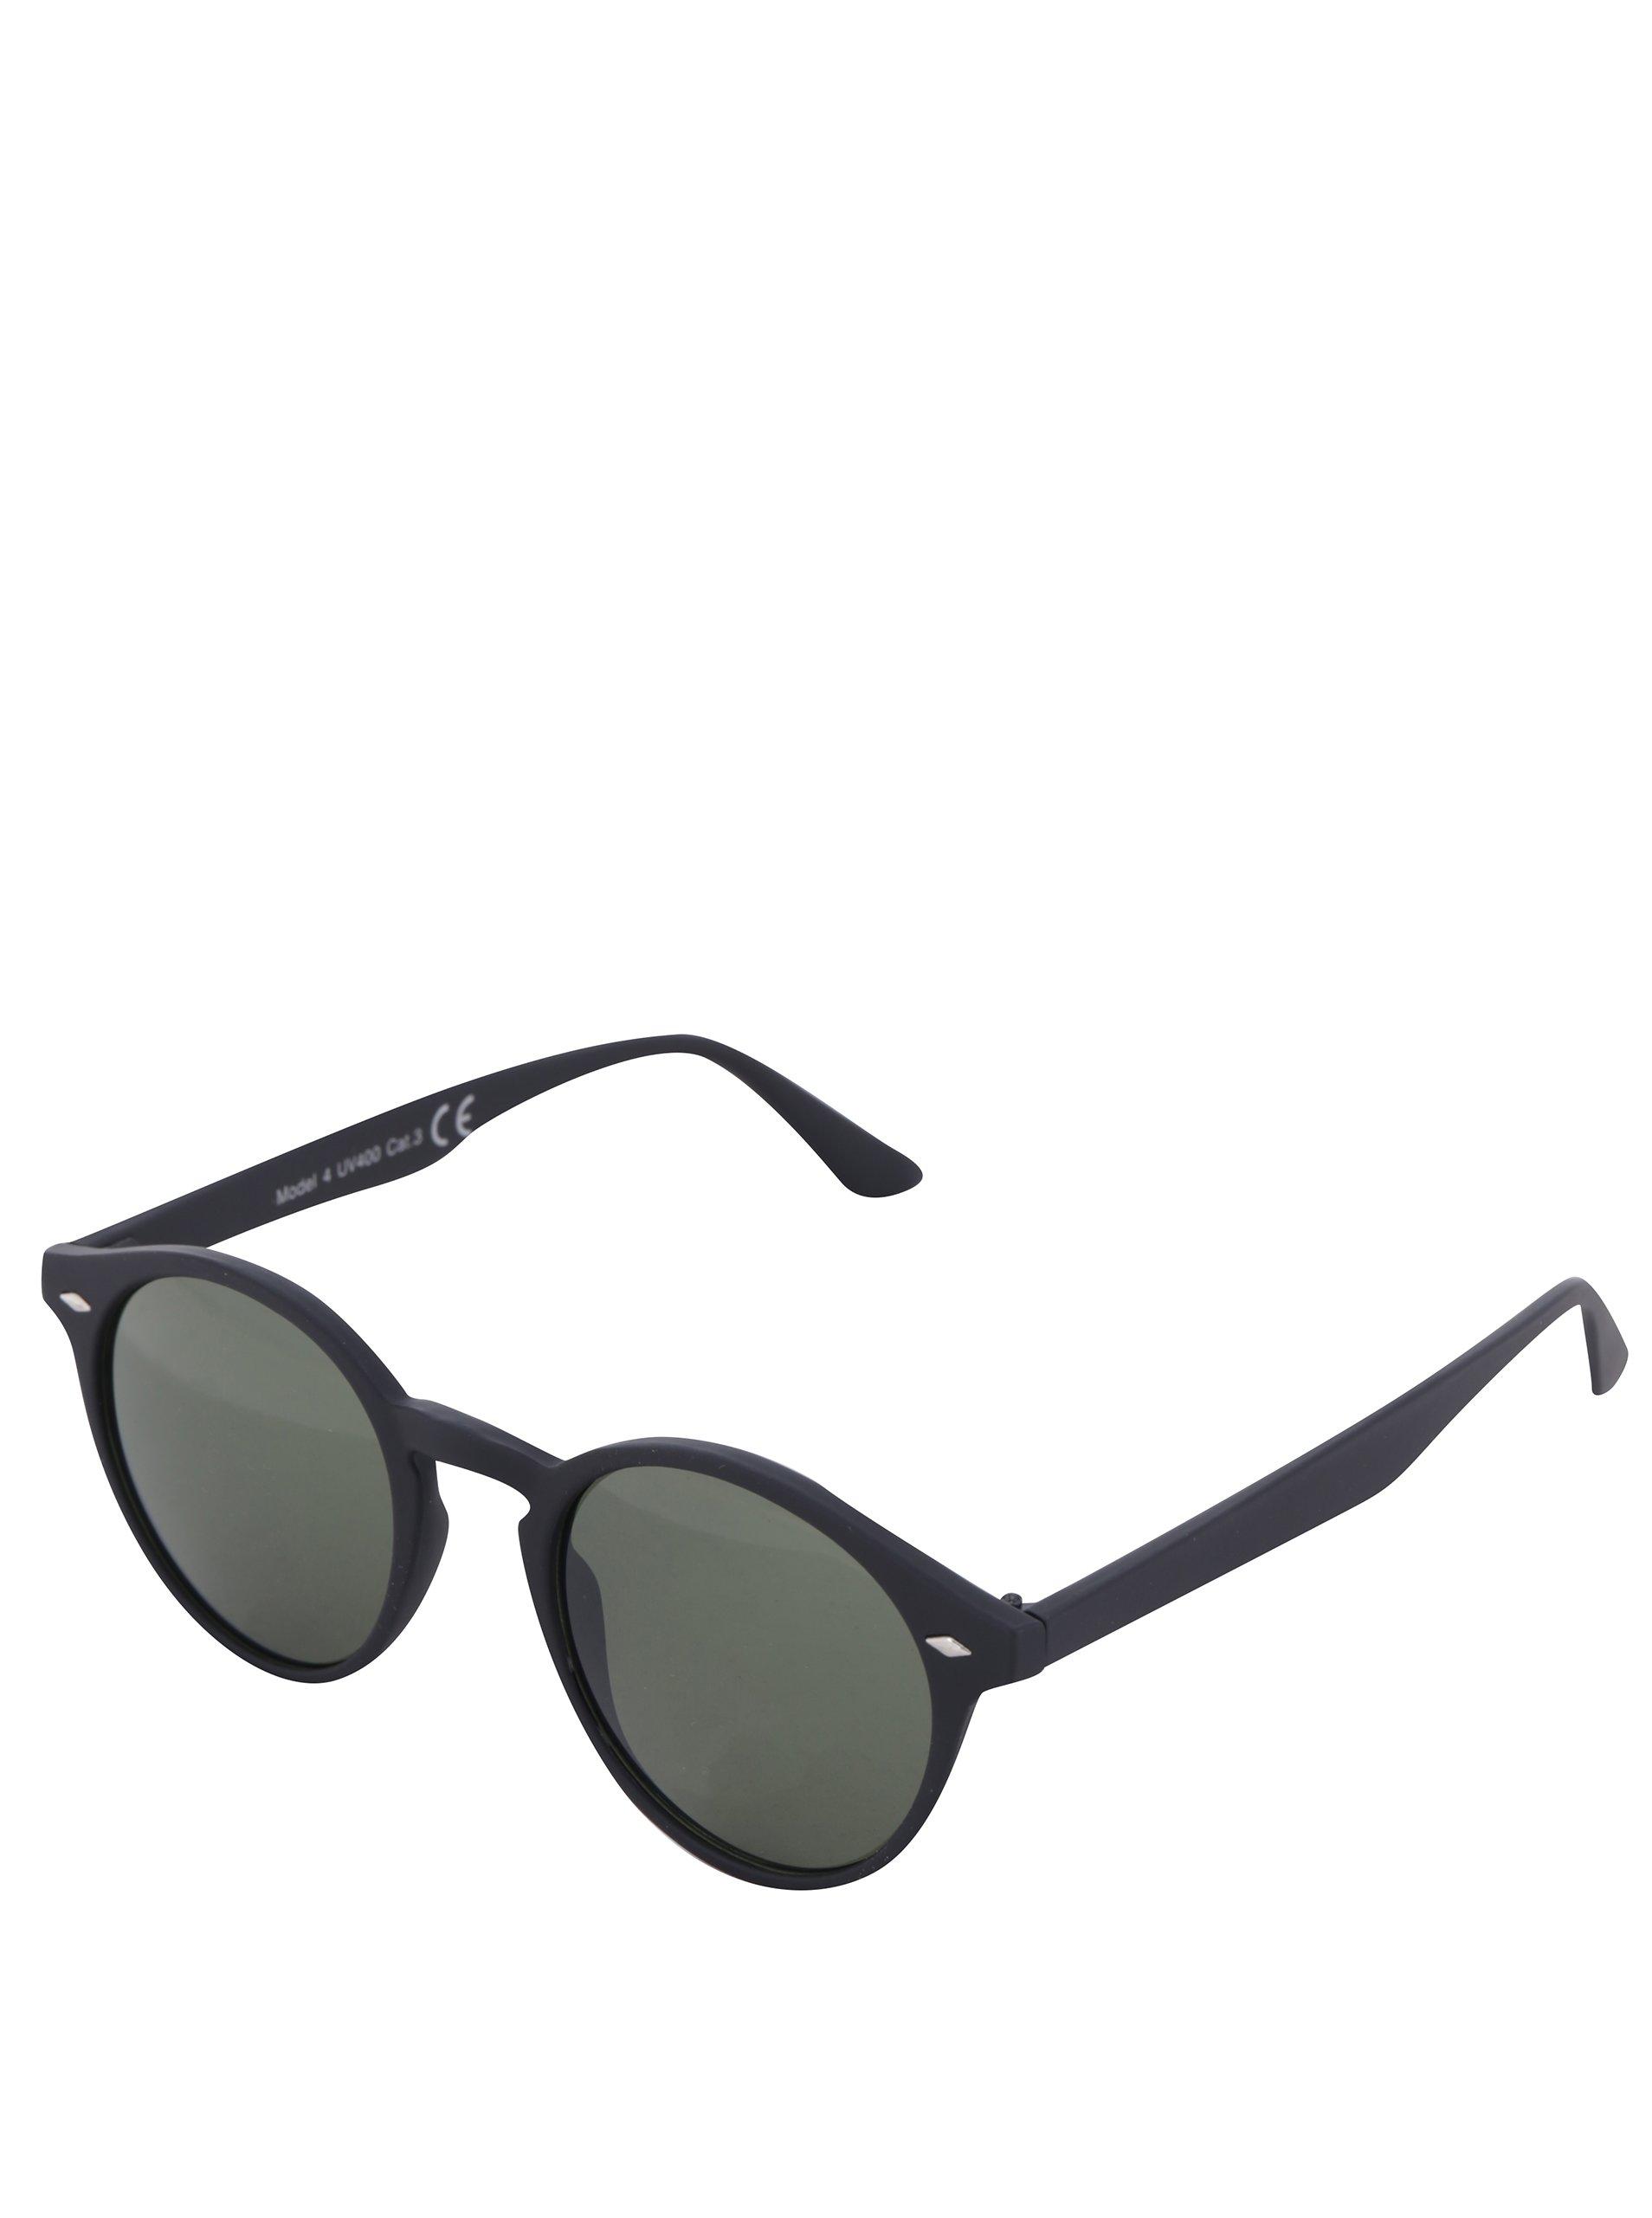 Čierne okrúhle slnečné unisex okuliare ONLY   SONS Sunglasses 4d4108778c8